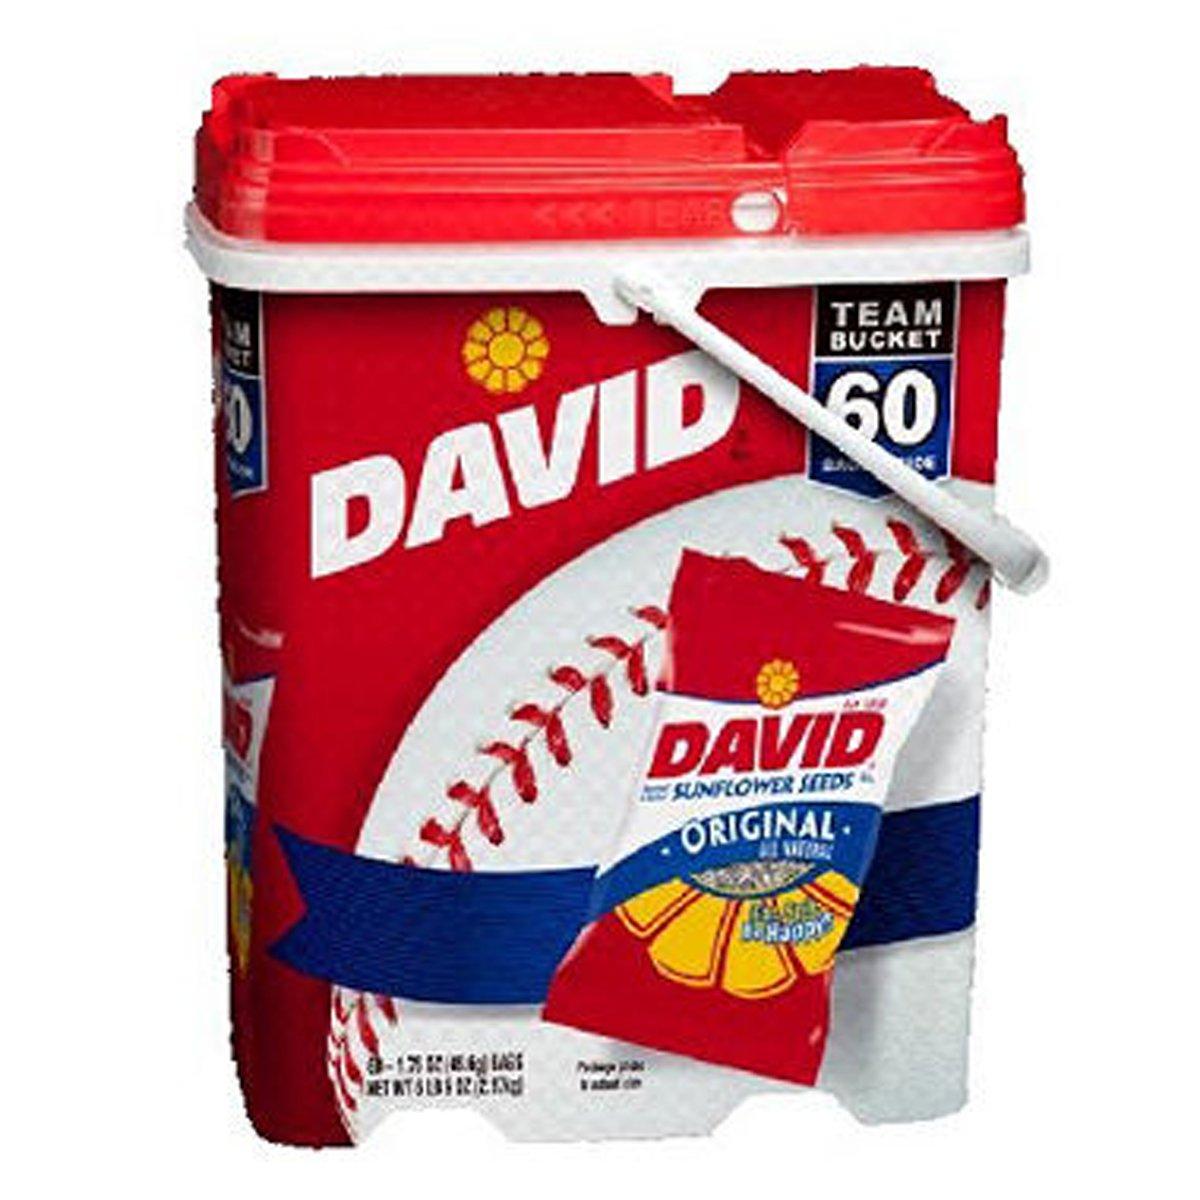 SCS David Sunflower Seed Bucket - 1.75 oz. pk. - 60 ct. by DAVID Seeds